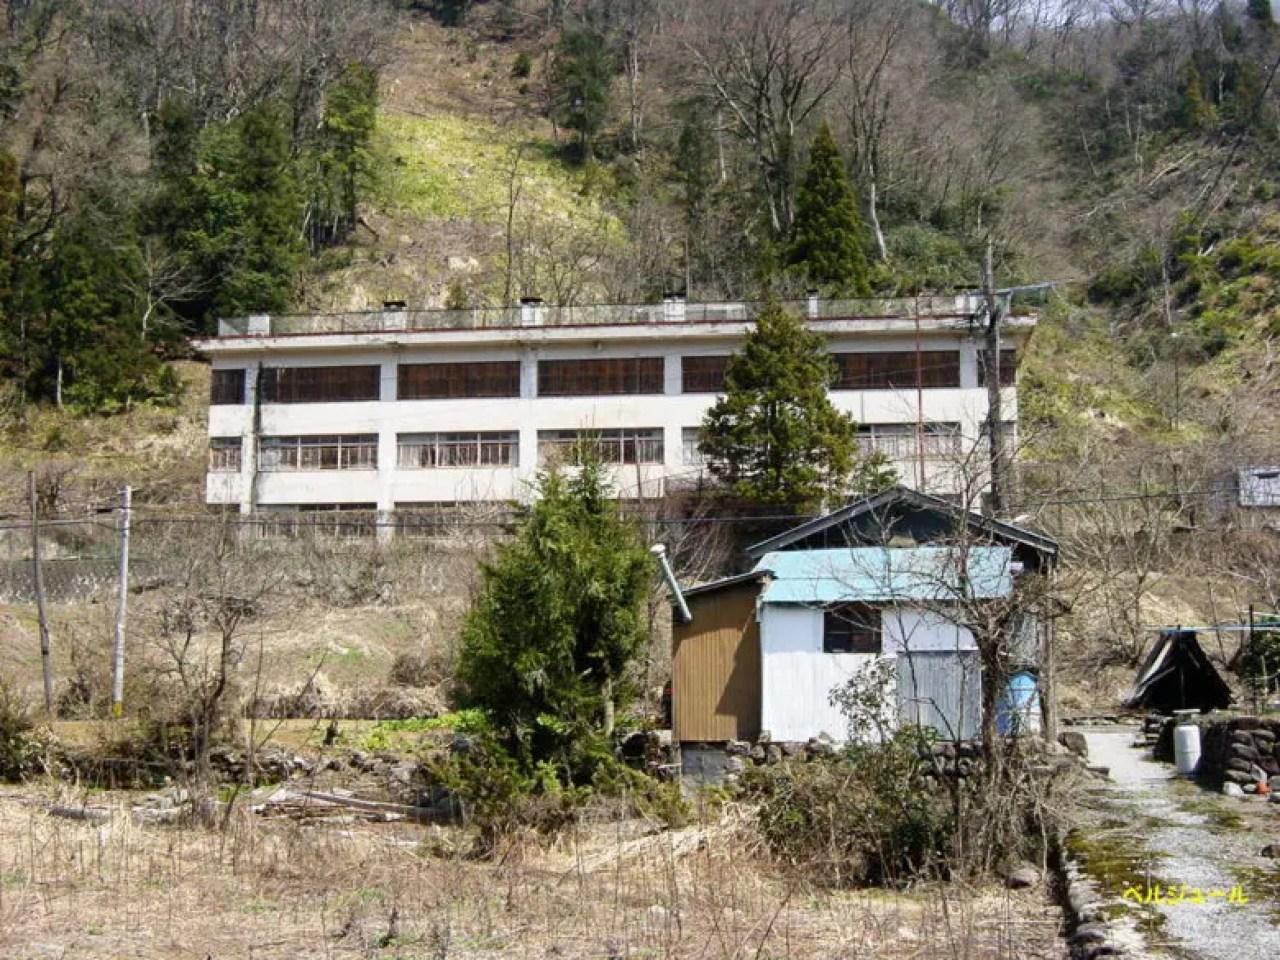 tokuyama00011 - 揖斐川上流・旧徳山村での岩魚釣り